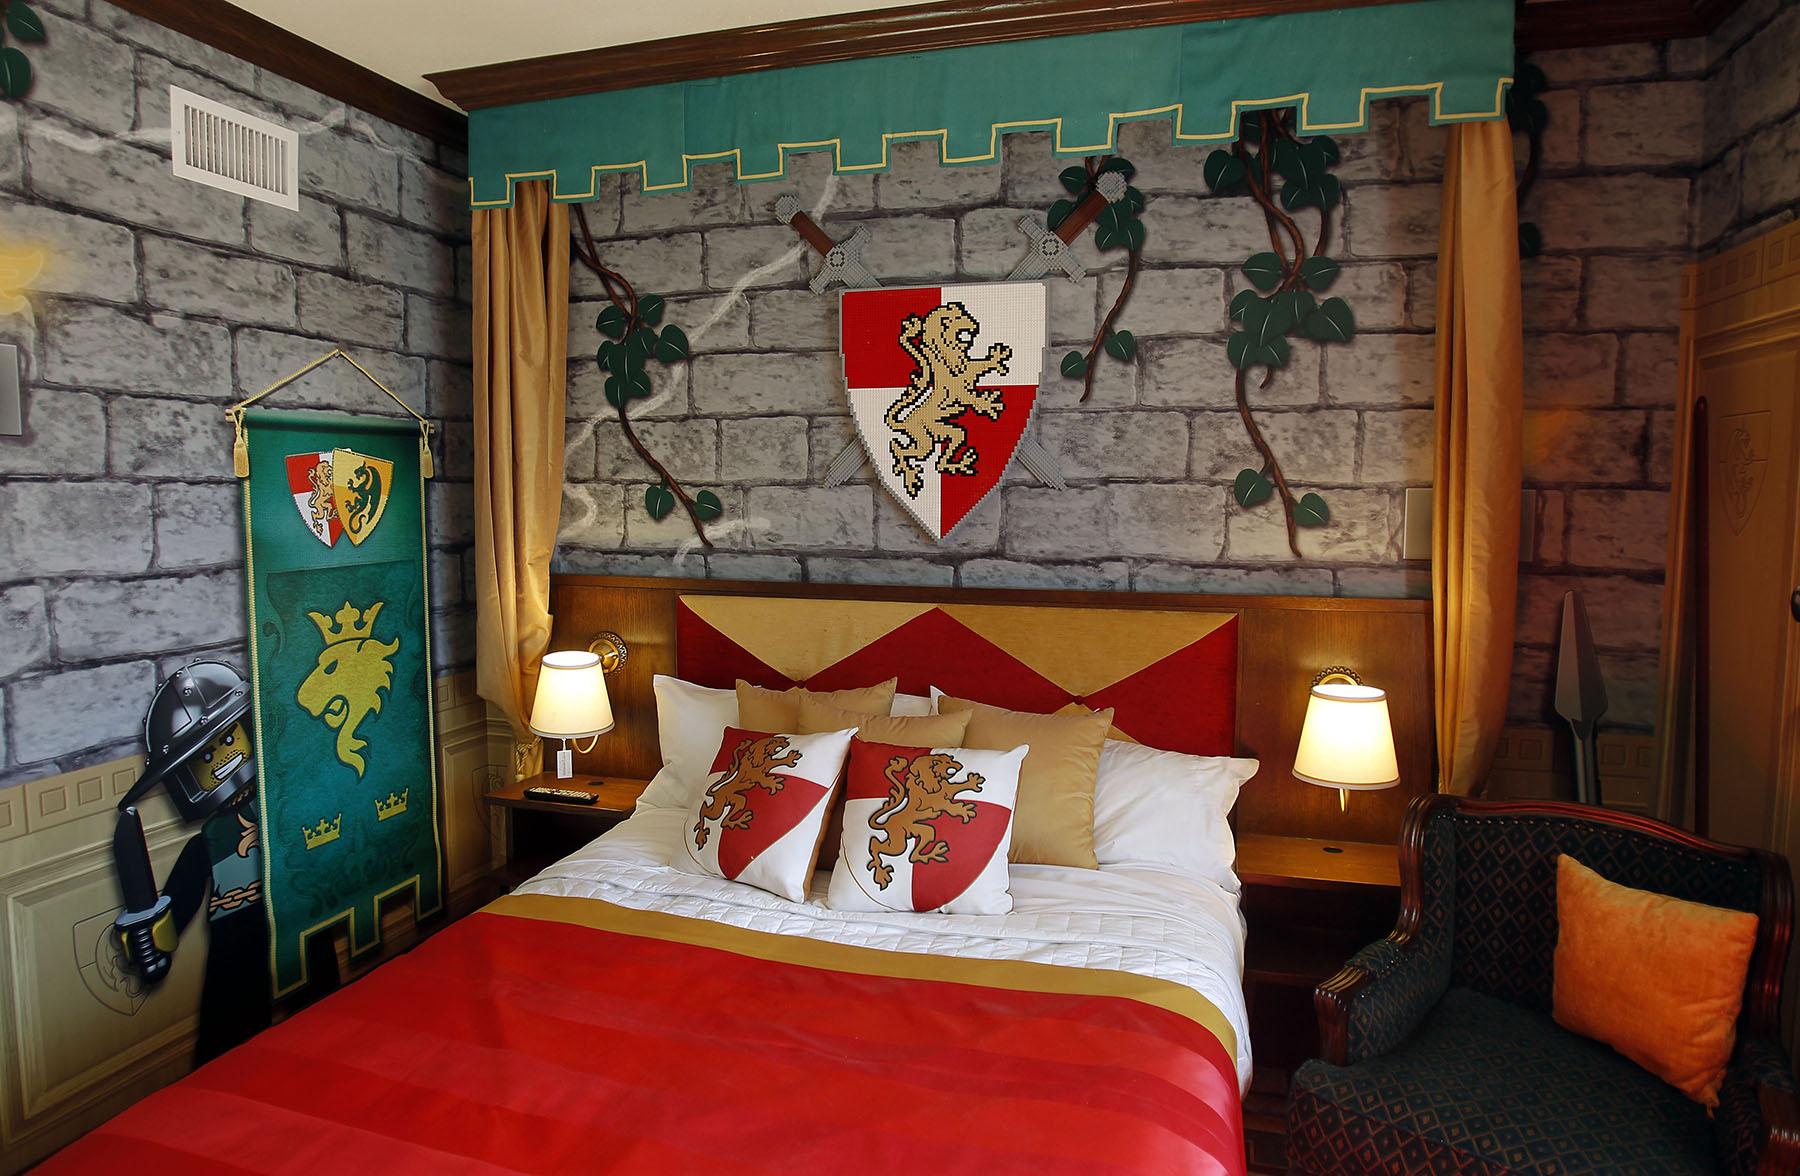 Knight room decor